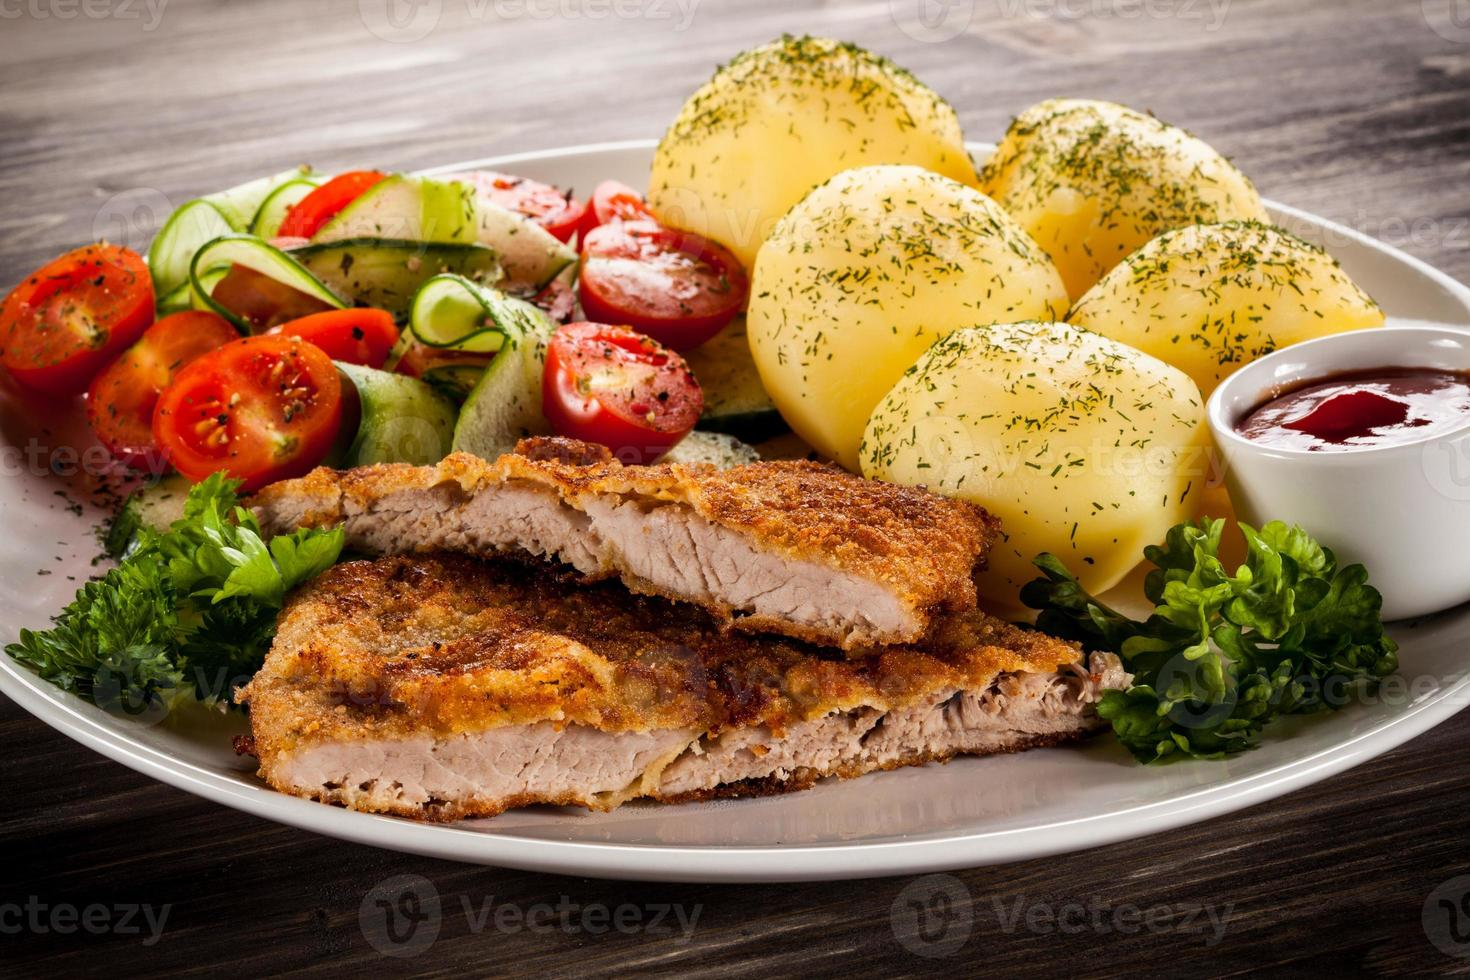 Chuletas de cerdo fritas, patatas hervidas y verduras sobre fondo de madera foto